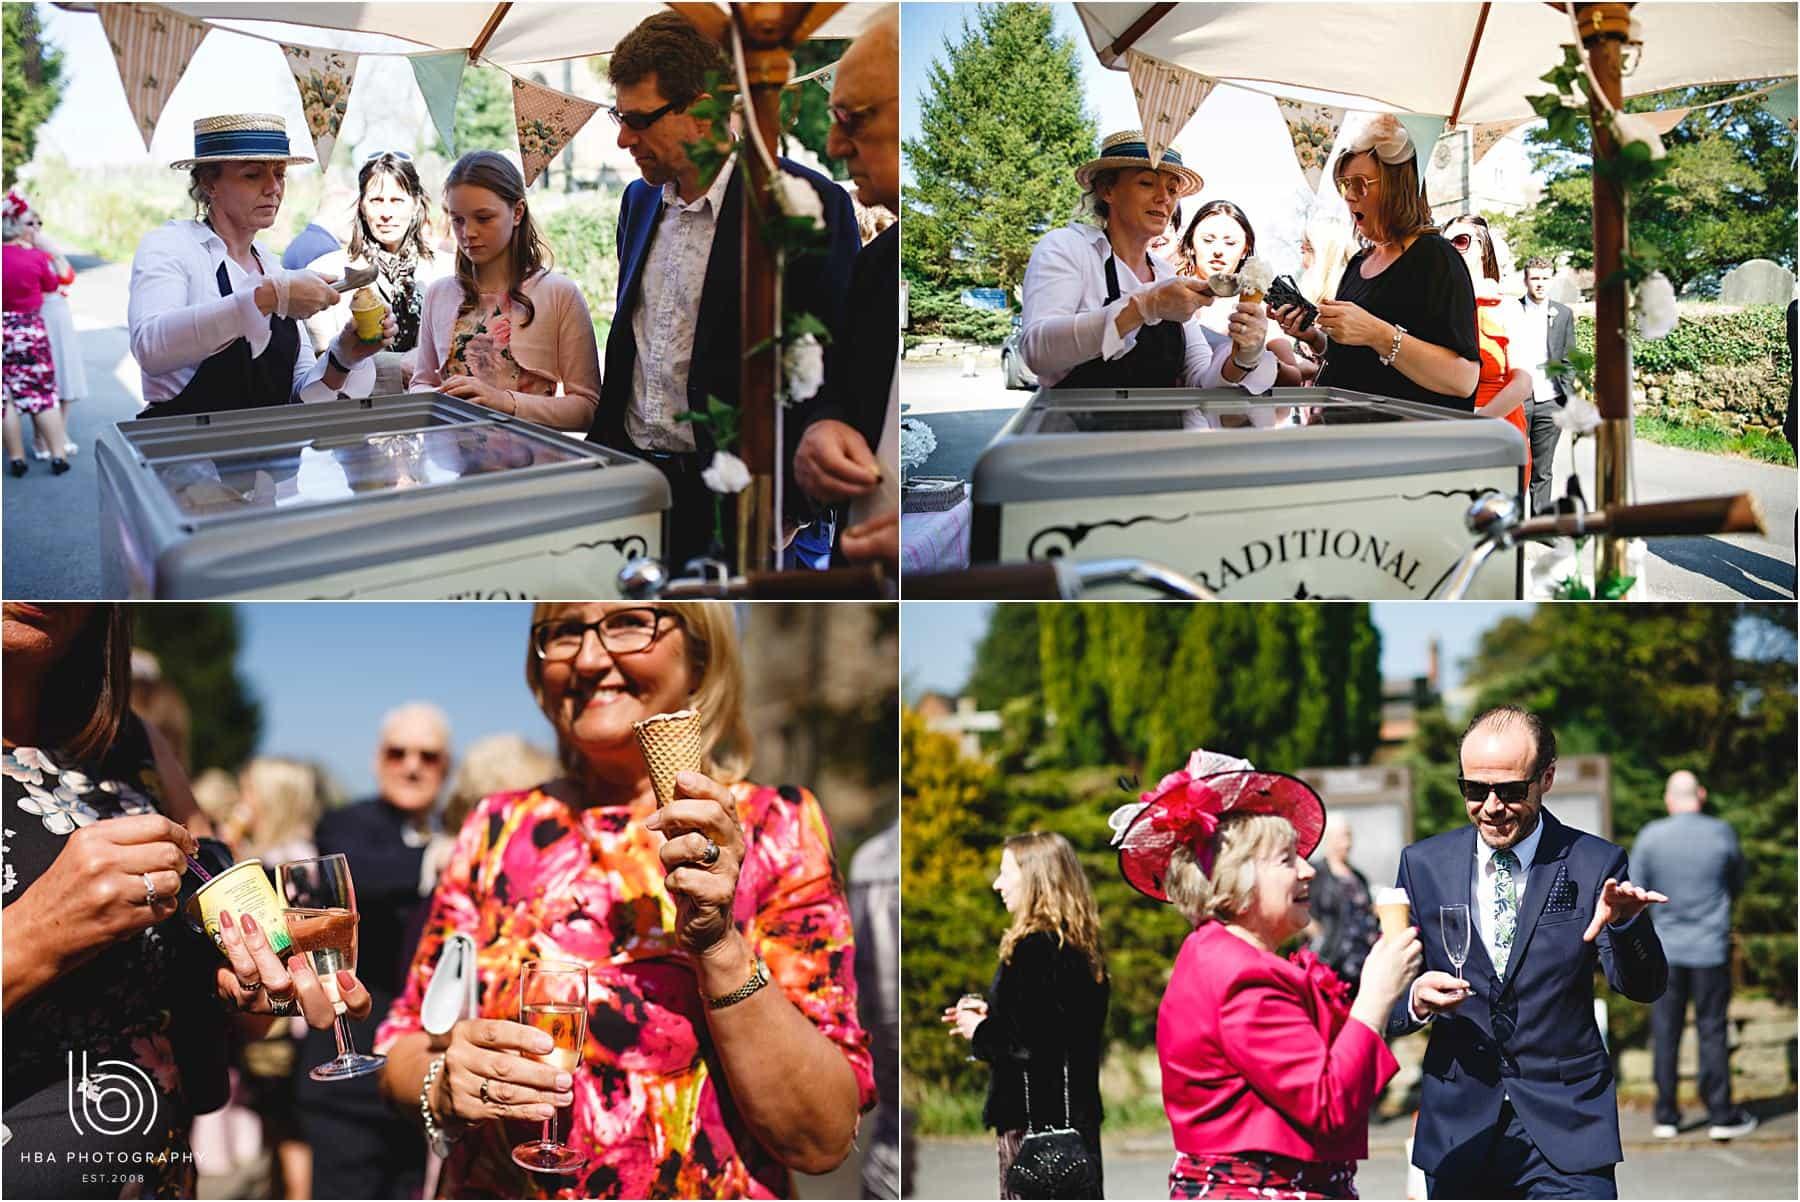 wedding guests enjoying Ice cream in Ellastone